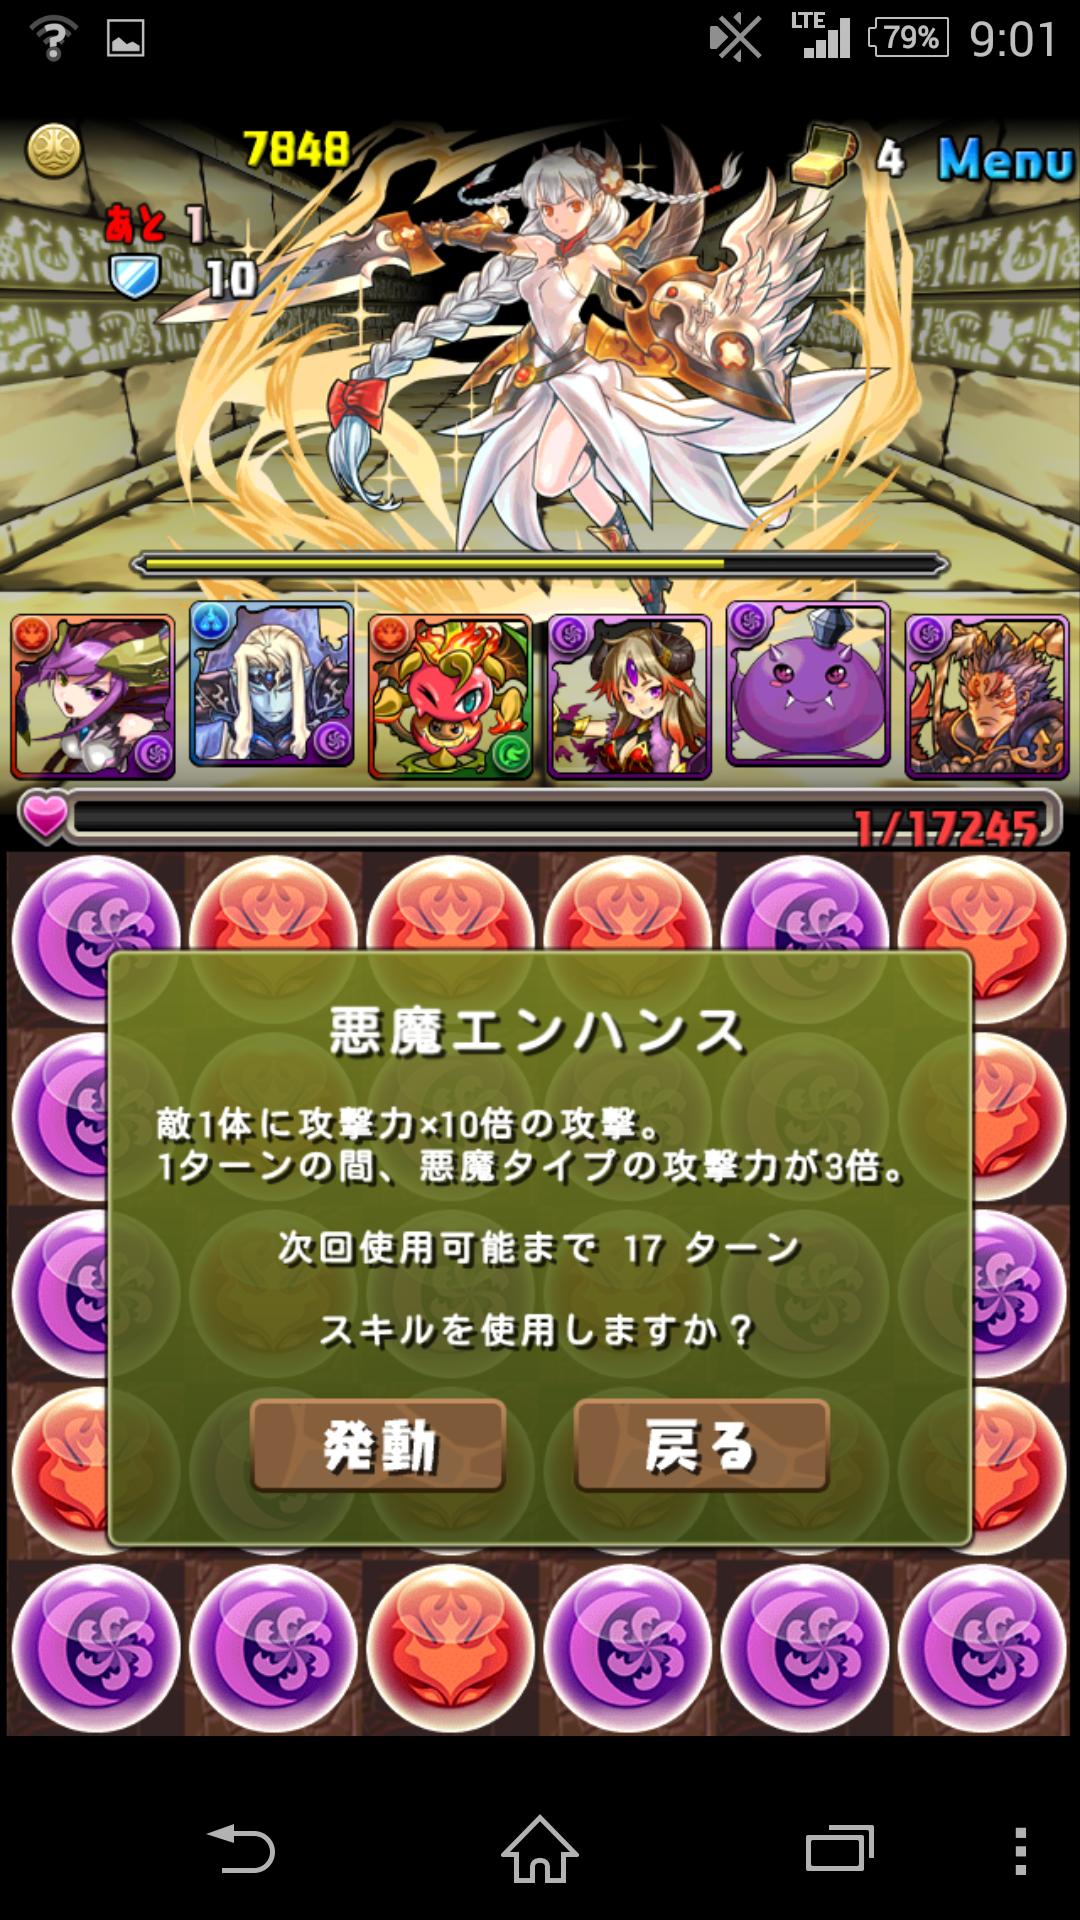 Screenshot_2014-11-15-09-01-30.png